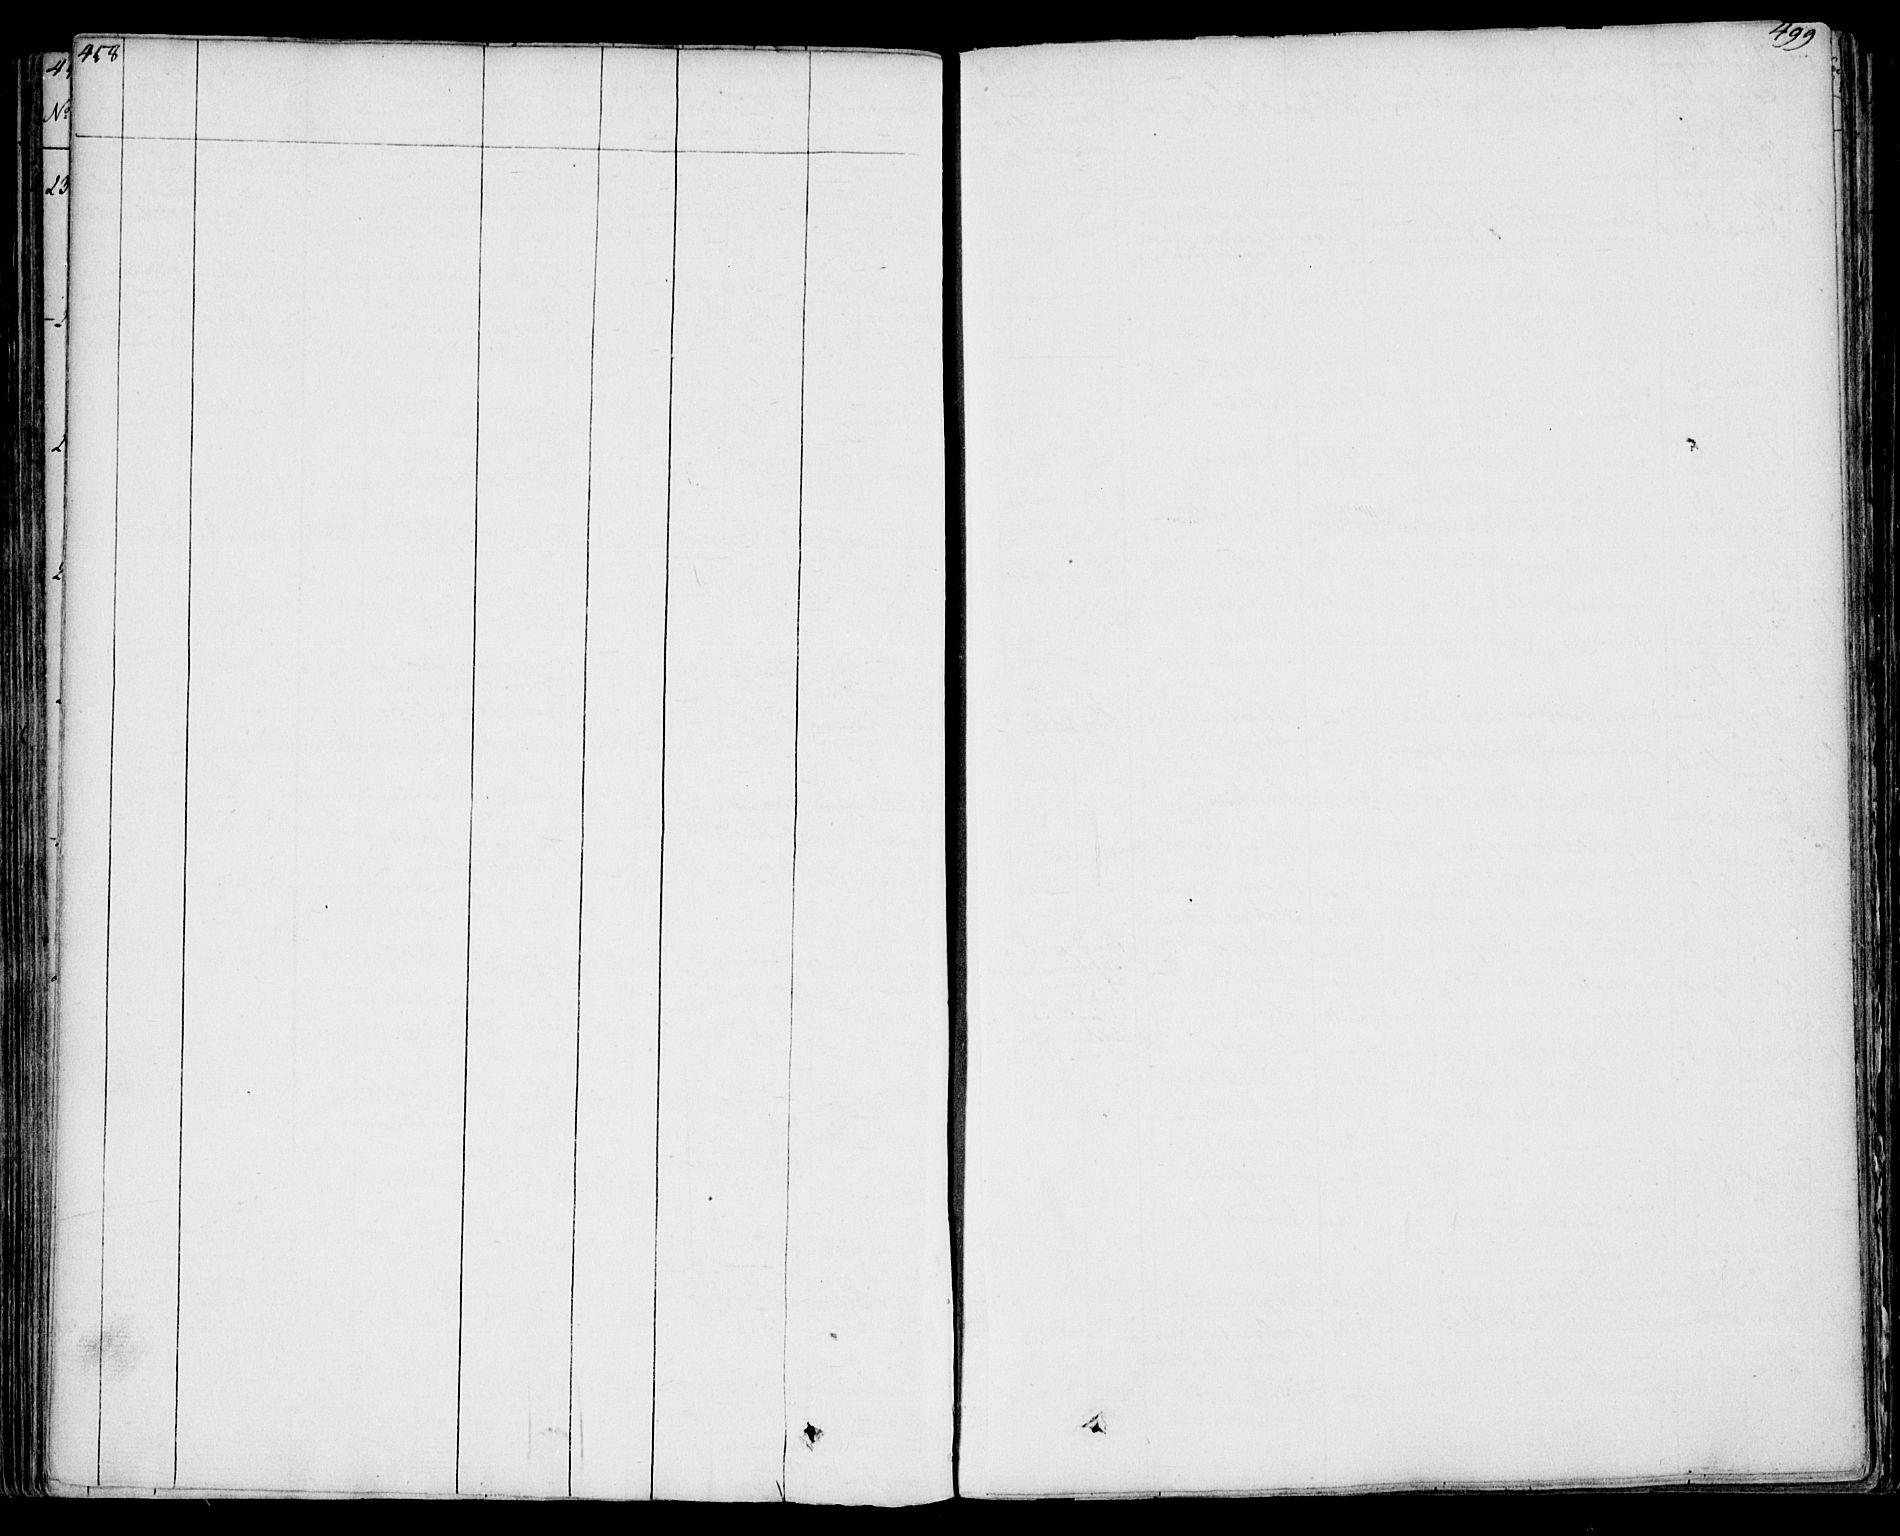 SAKO, Bamble kirkebøker, F/Fa/L0004: Ministerialbok nr. I 4, 1834-1853, s. 498-499